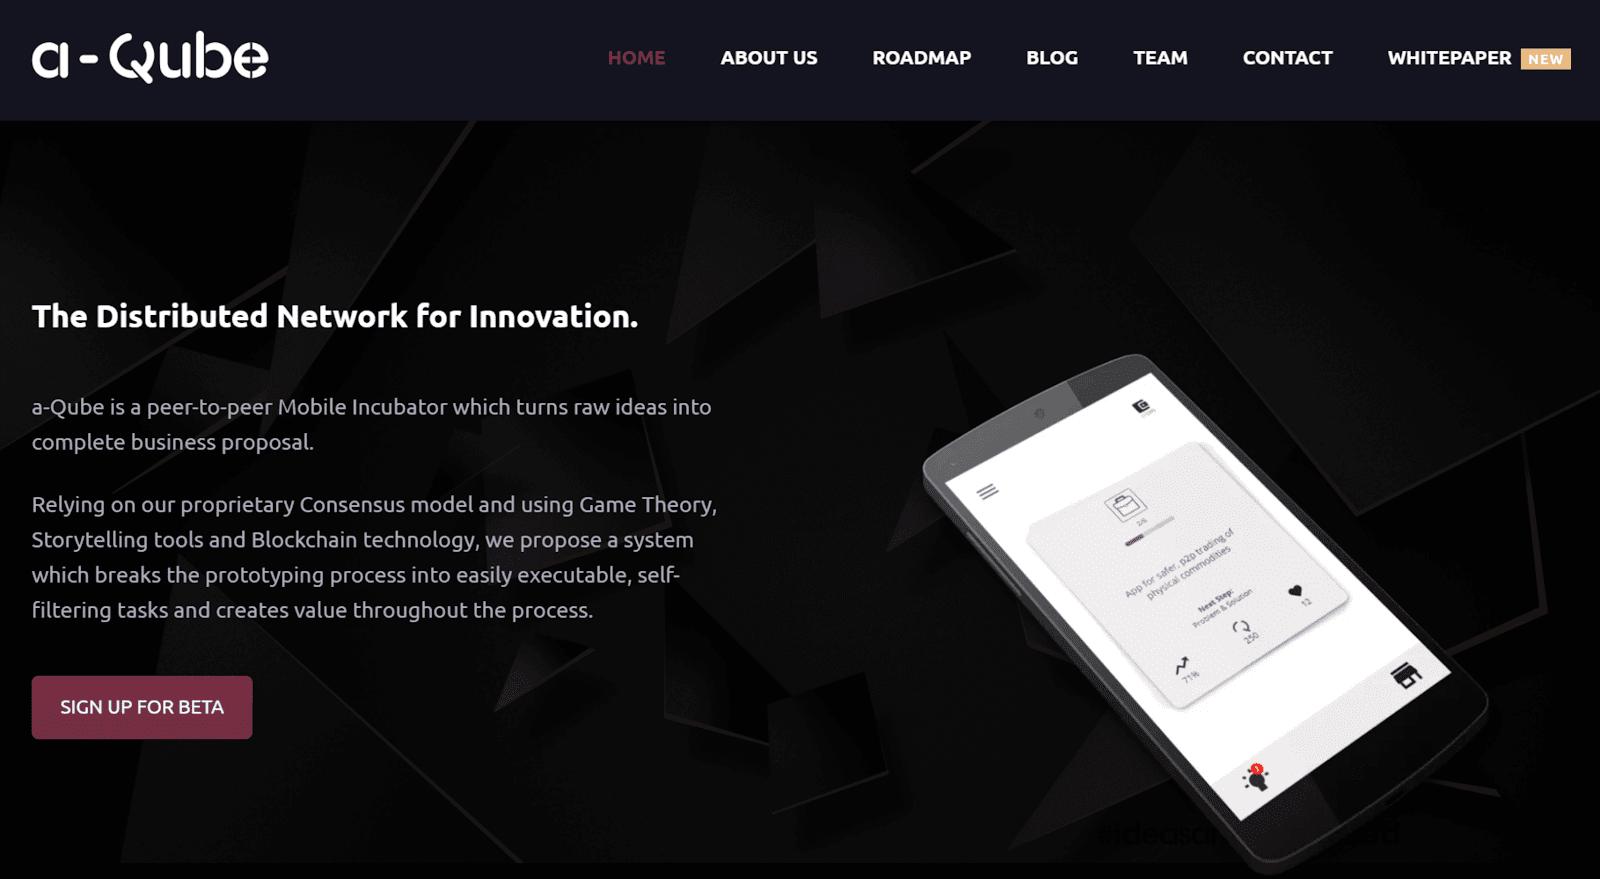 a-Qube - a P2P Marketplace for Business Ideas